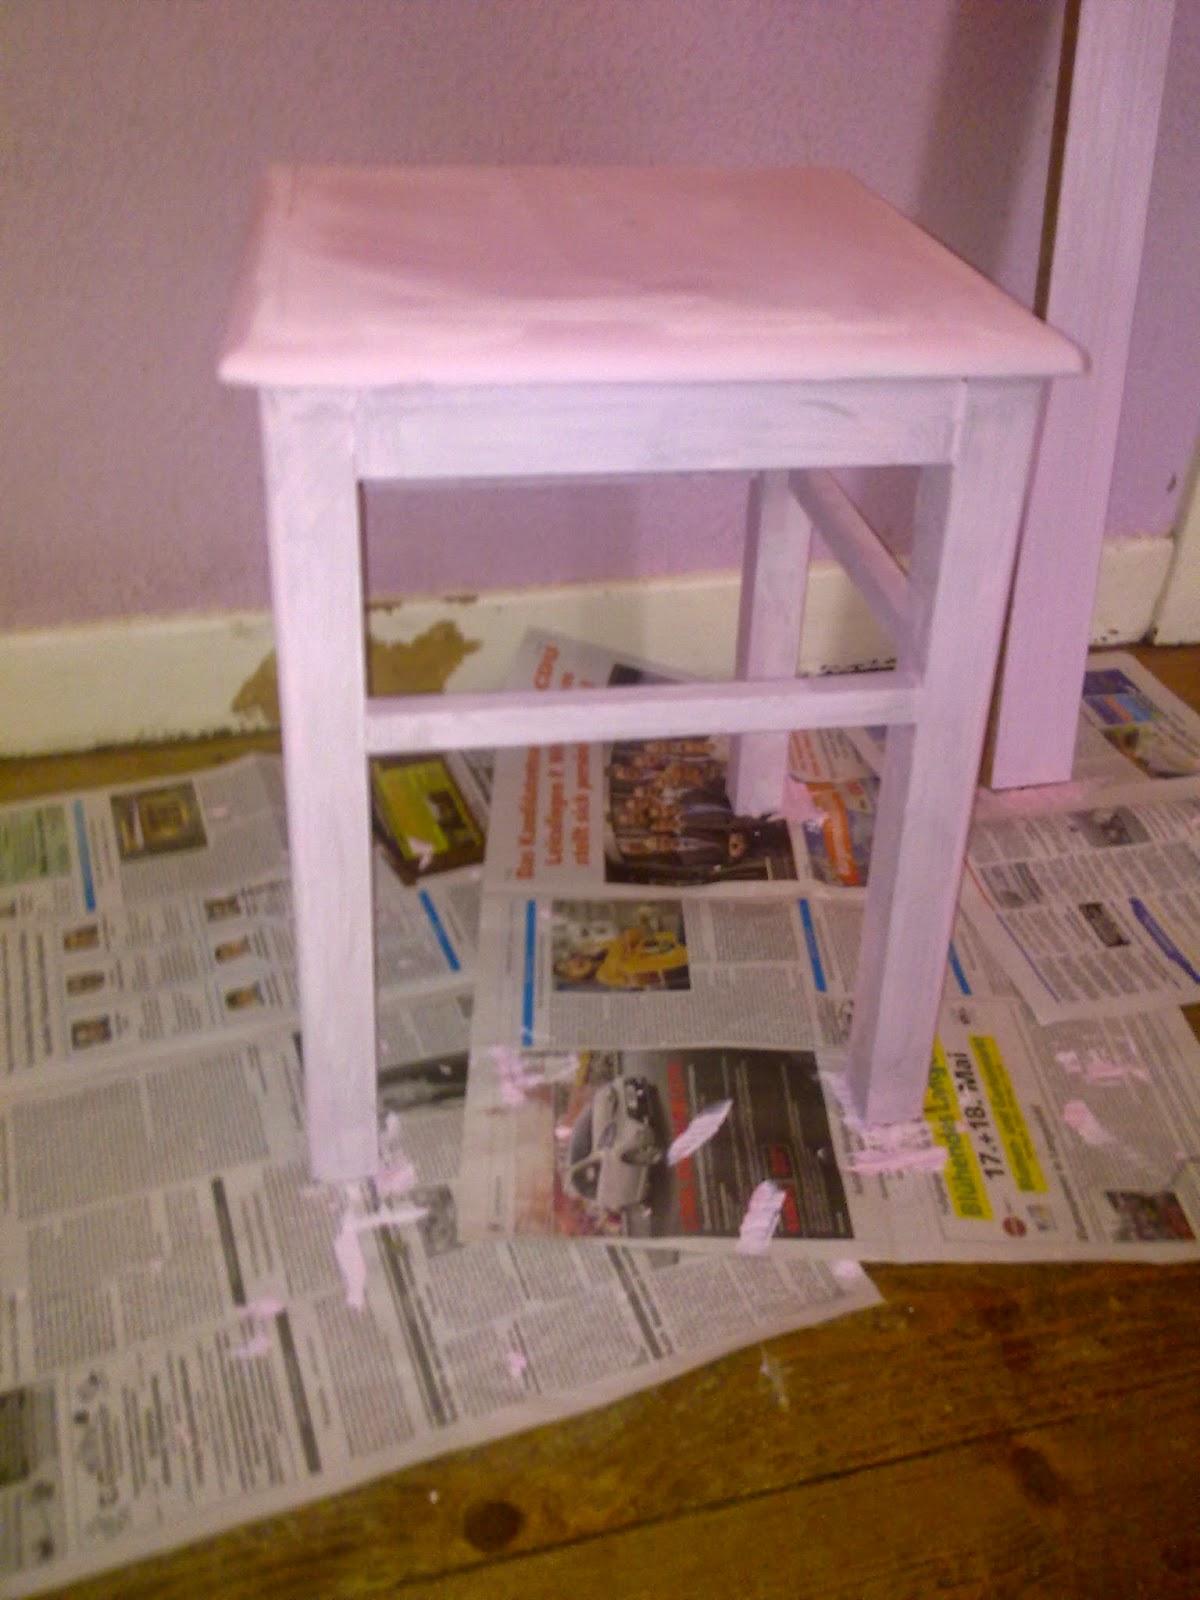 frau werwolf 39 s hexenkessel kreidefarbe f r m bel versuch. Black Bedroom Furniture Sets. Home Design Ideas